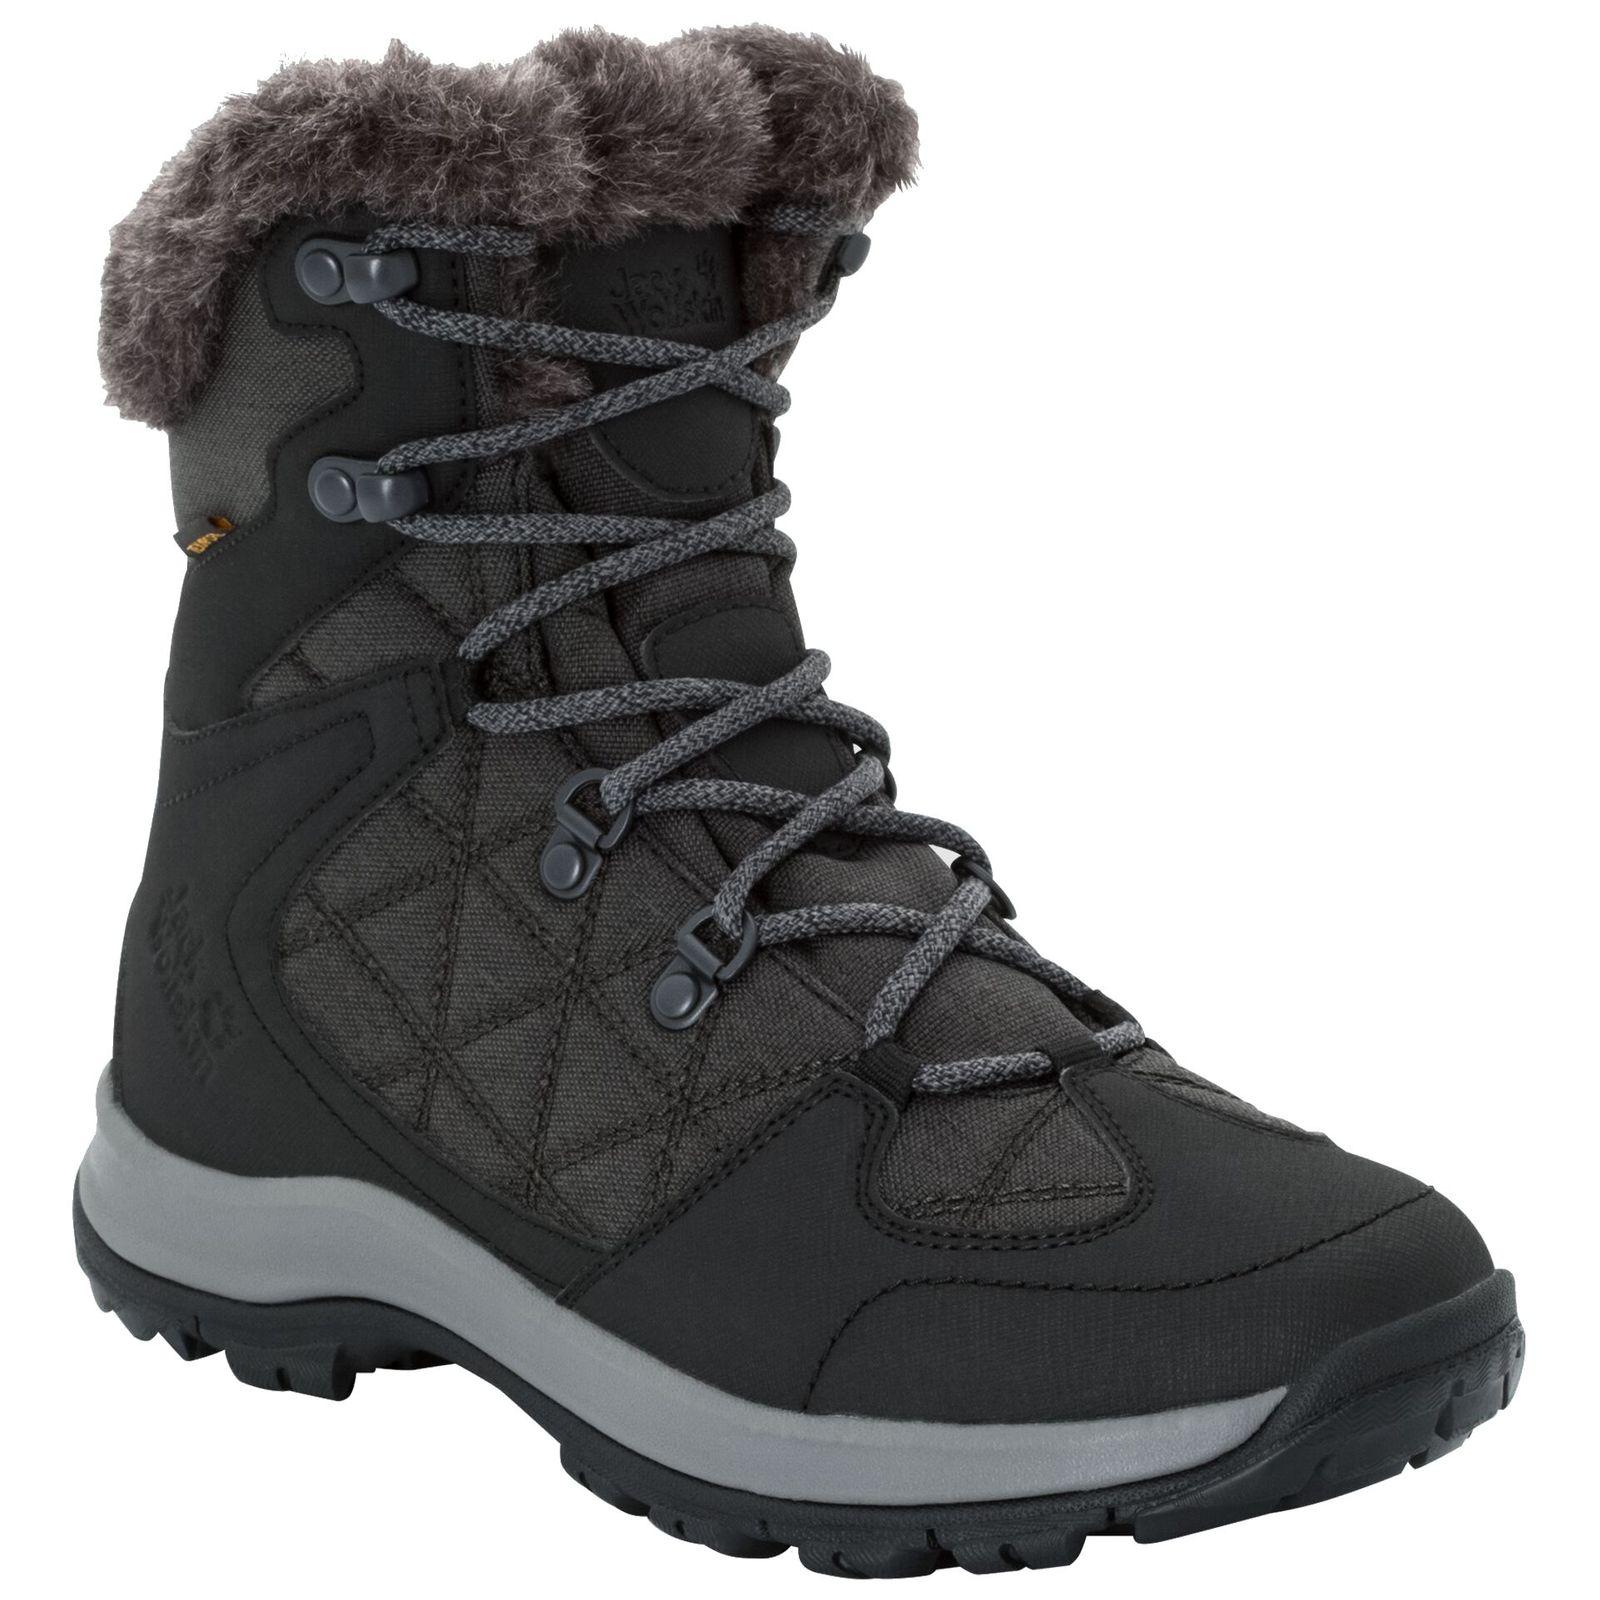 Mid About Thunder Ladies Jack Wolfskin Texapore Details Black Boots Bay Waterproof Winter erdBWoCx